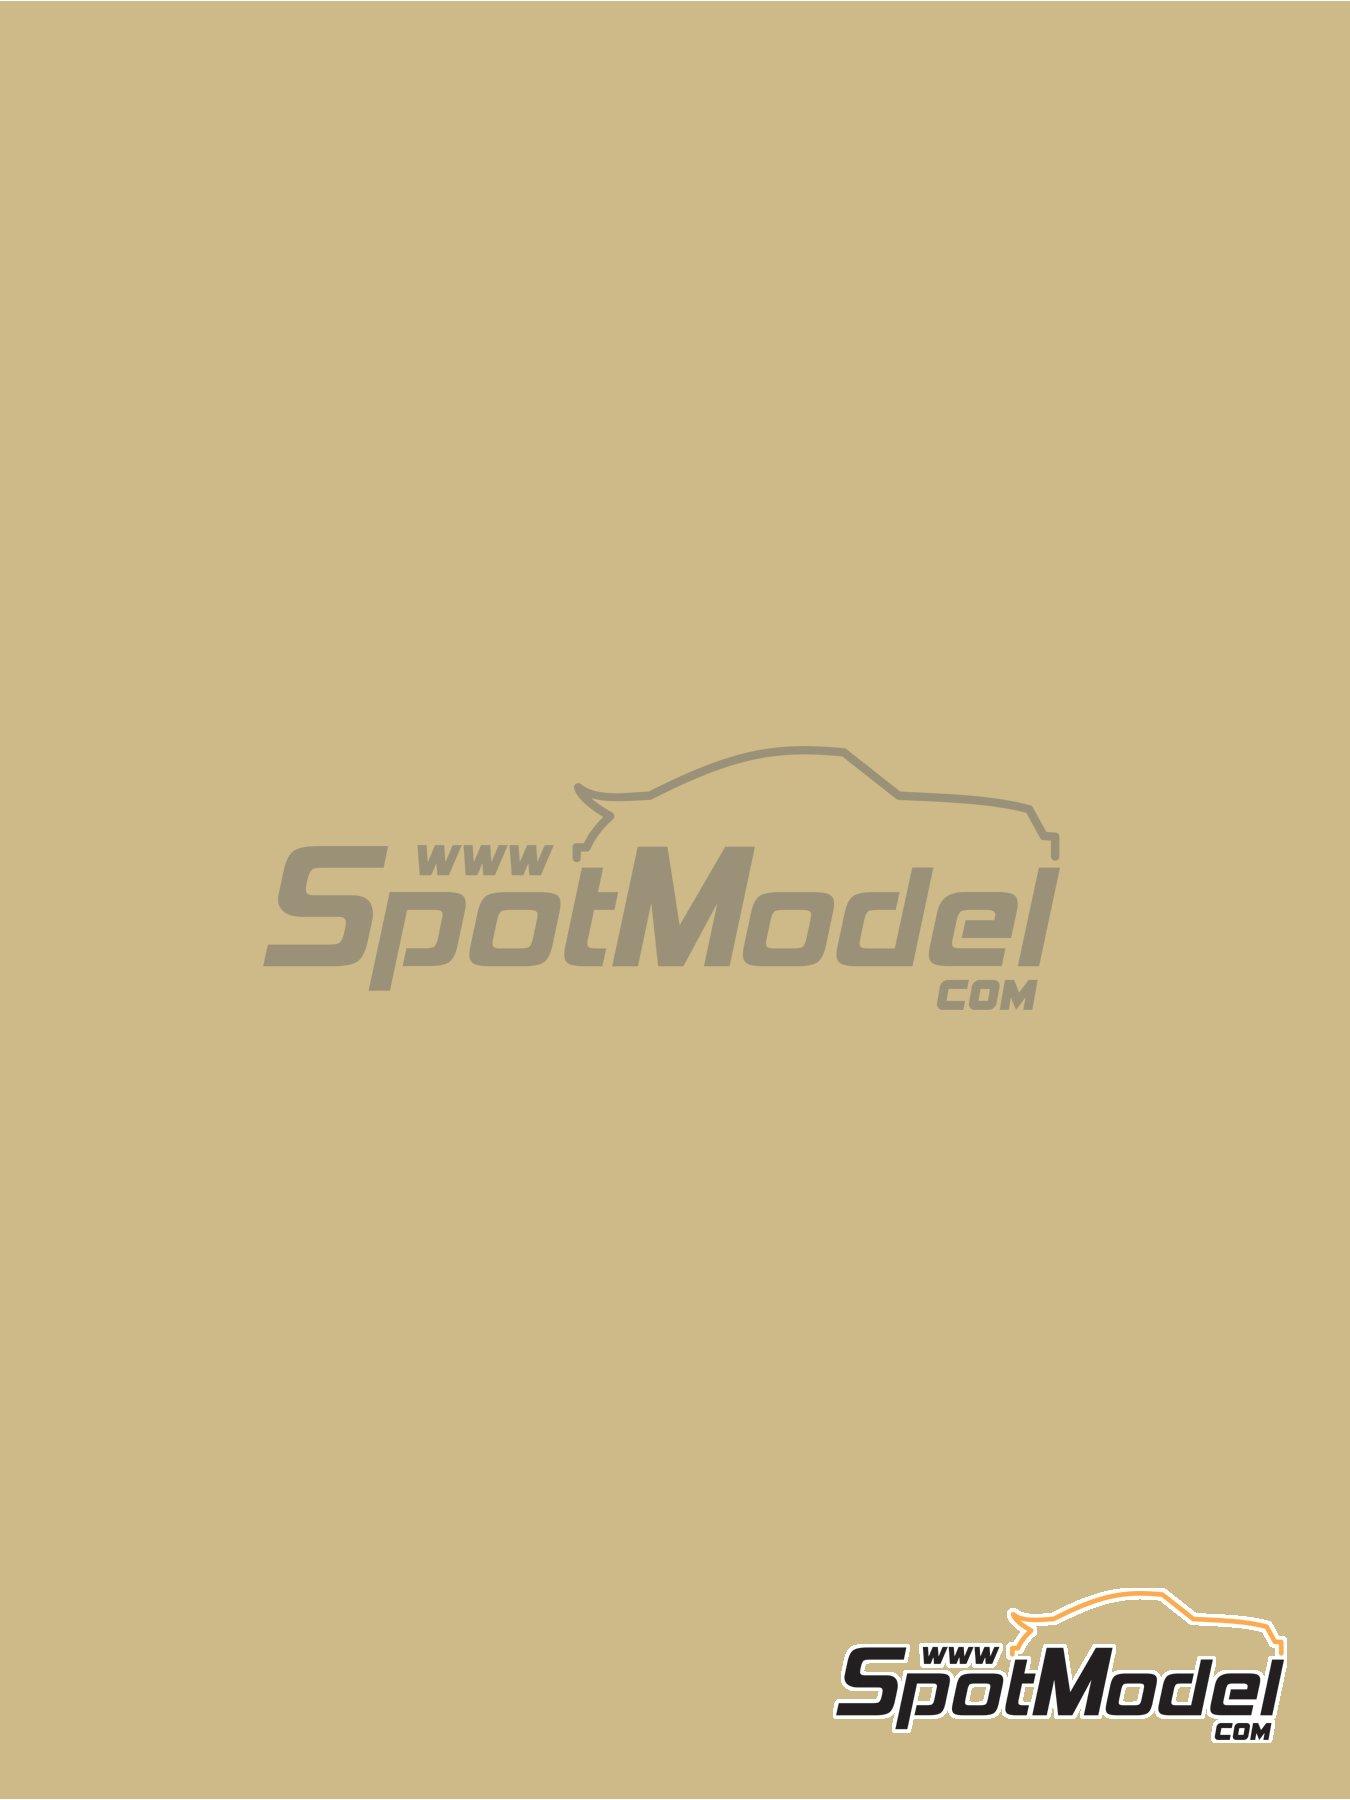 Beige verdoso - RAL1000 - Green beige - 1 x 60ml | Pintura fabricado por Zero Paints (ref.ZP-1033-RAL1000) image